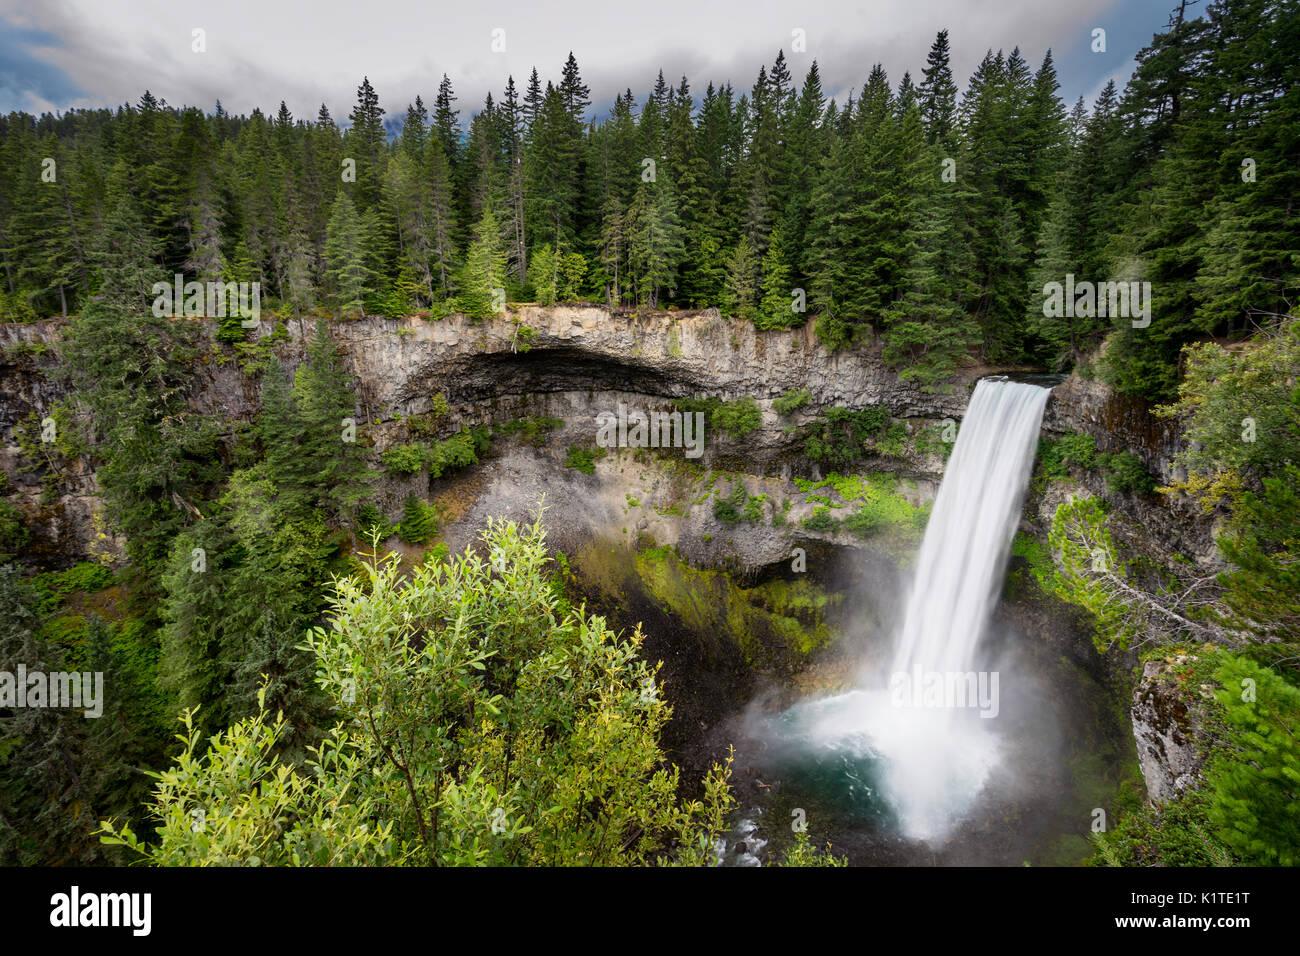 Landscape photo of Brandywine Falls in Whistler, British Columbia, Canada - Stock Image